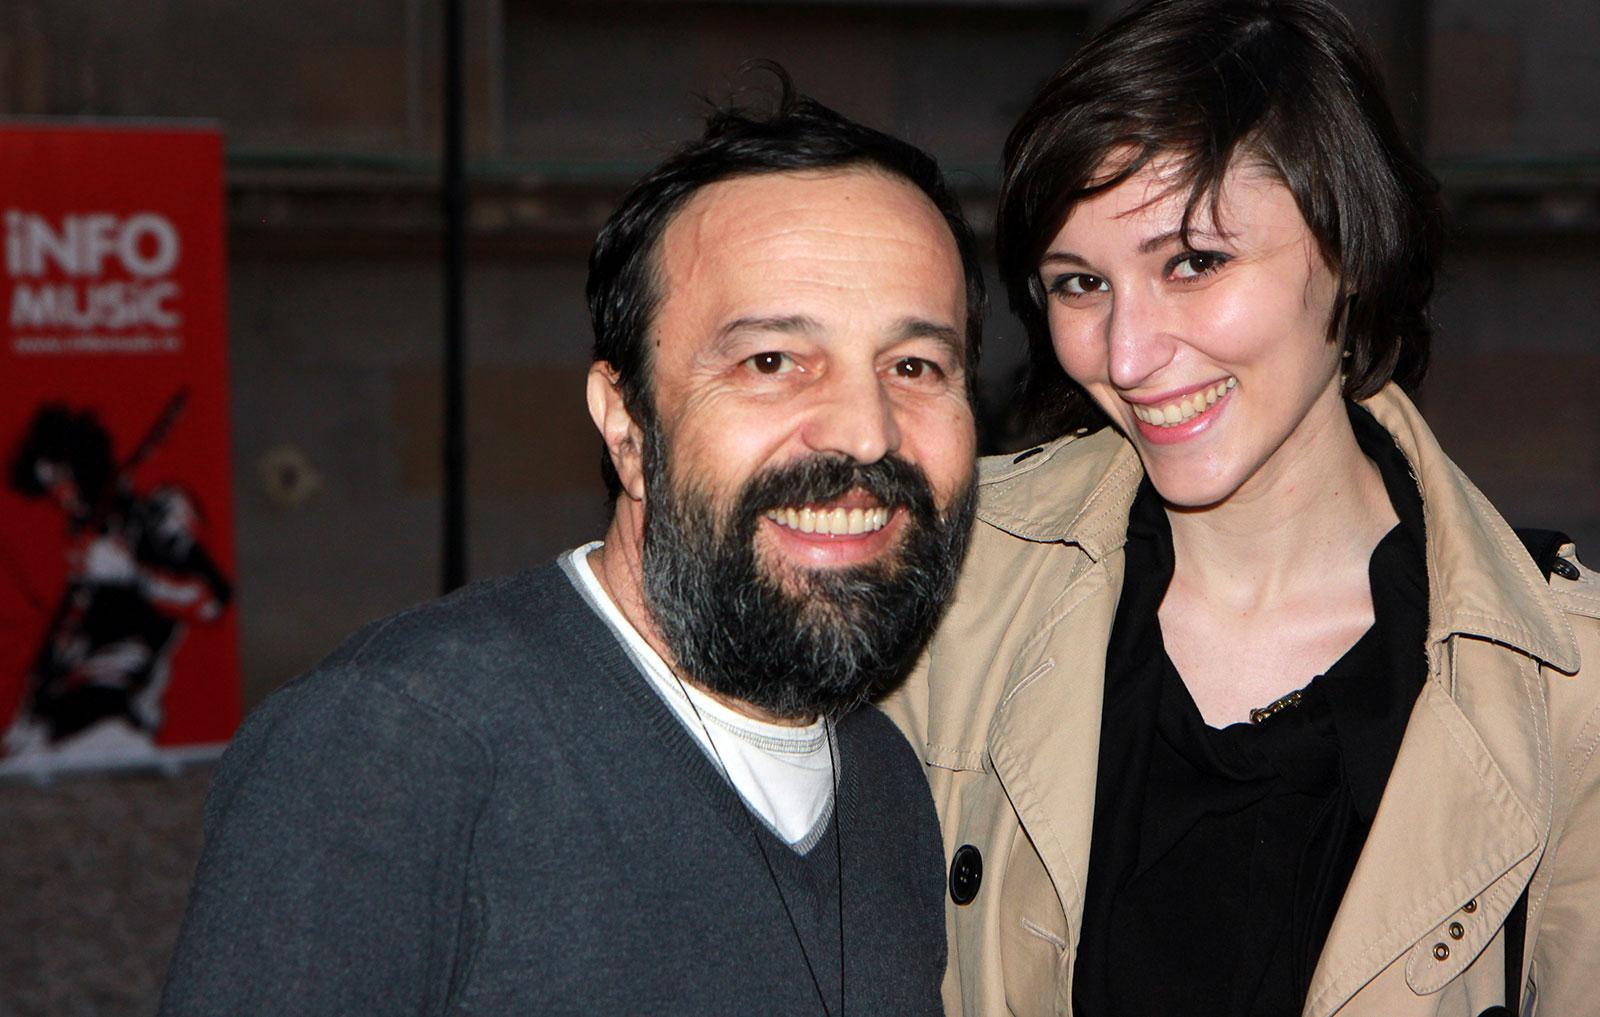 Ioan Gyuri Pascu intervievat de Alexandra Necula pentru InfoMusic.ro